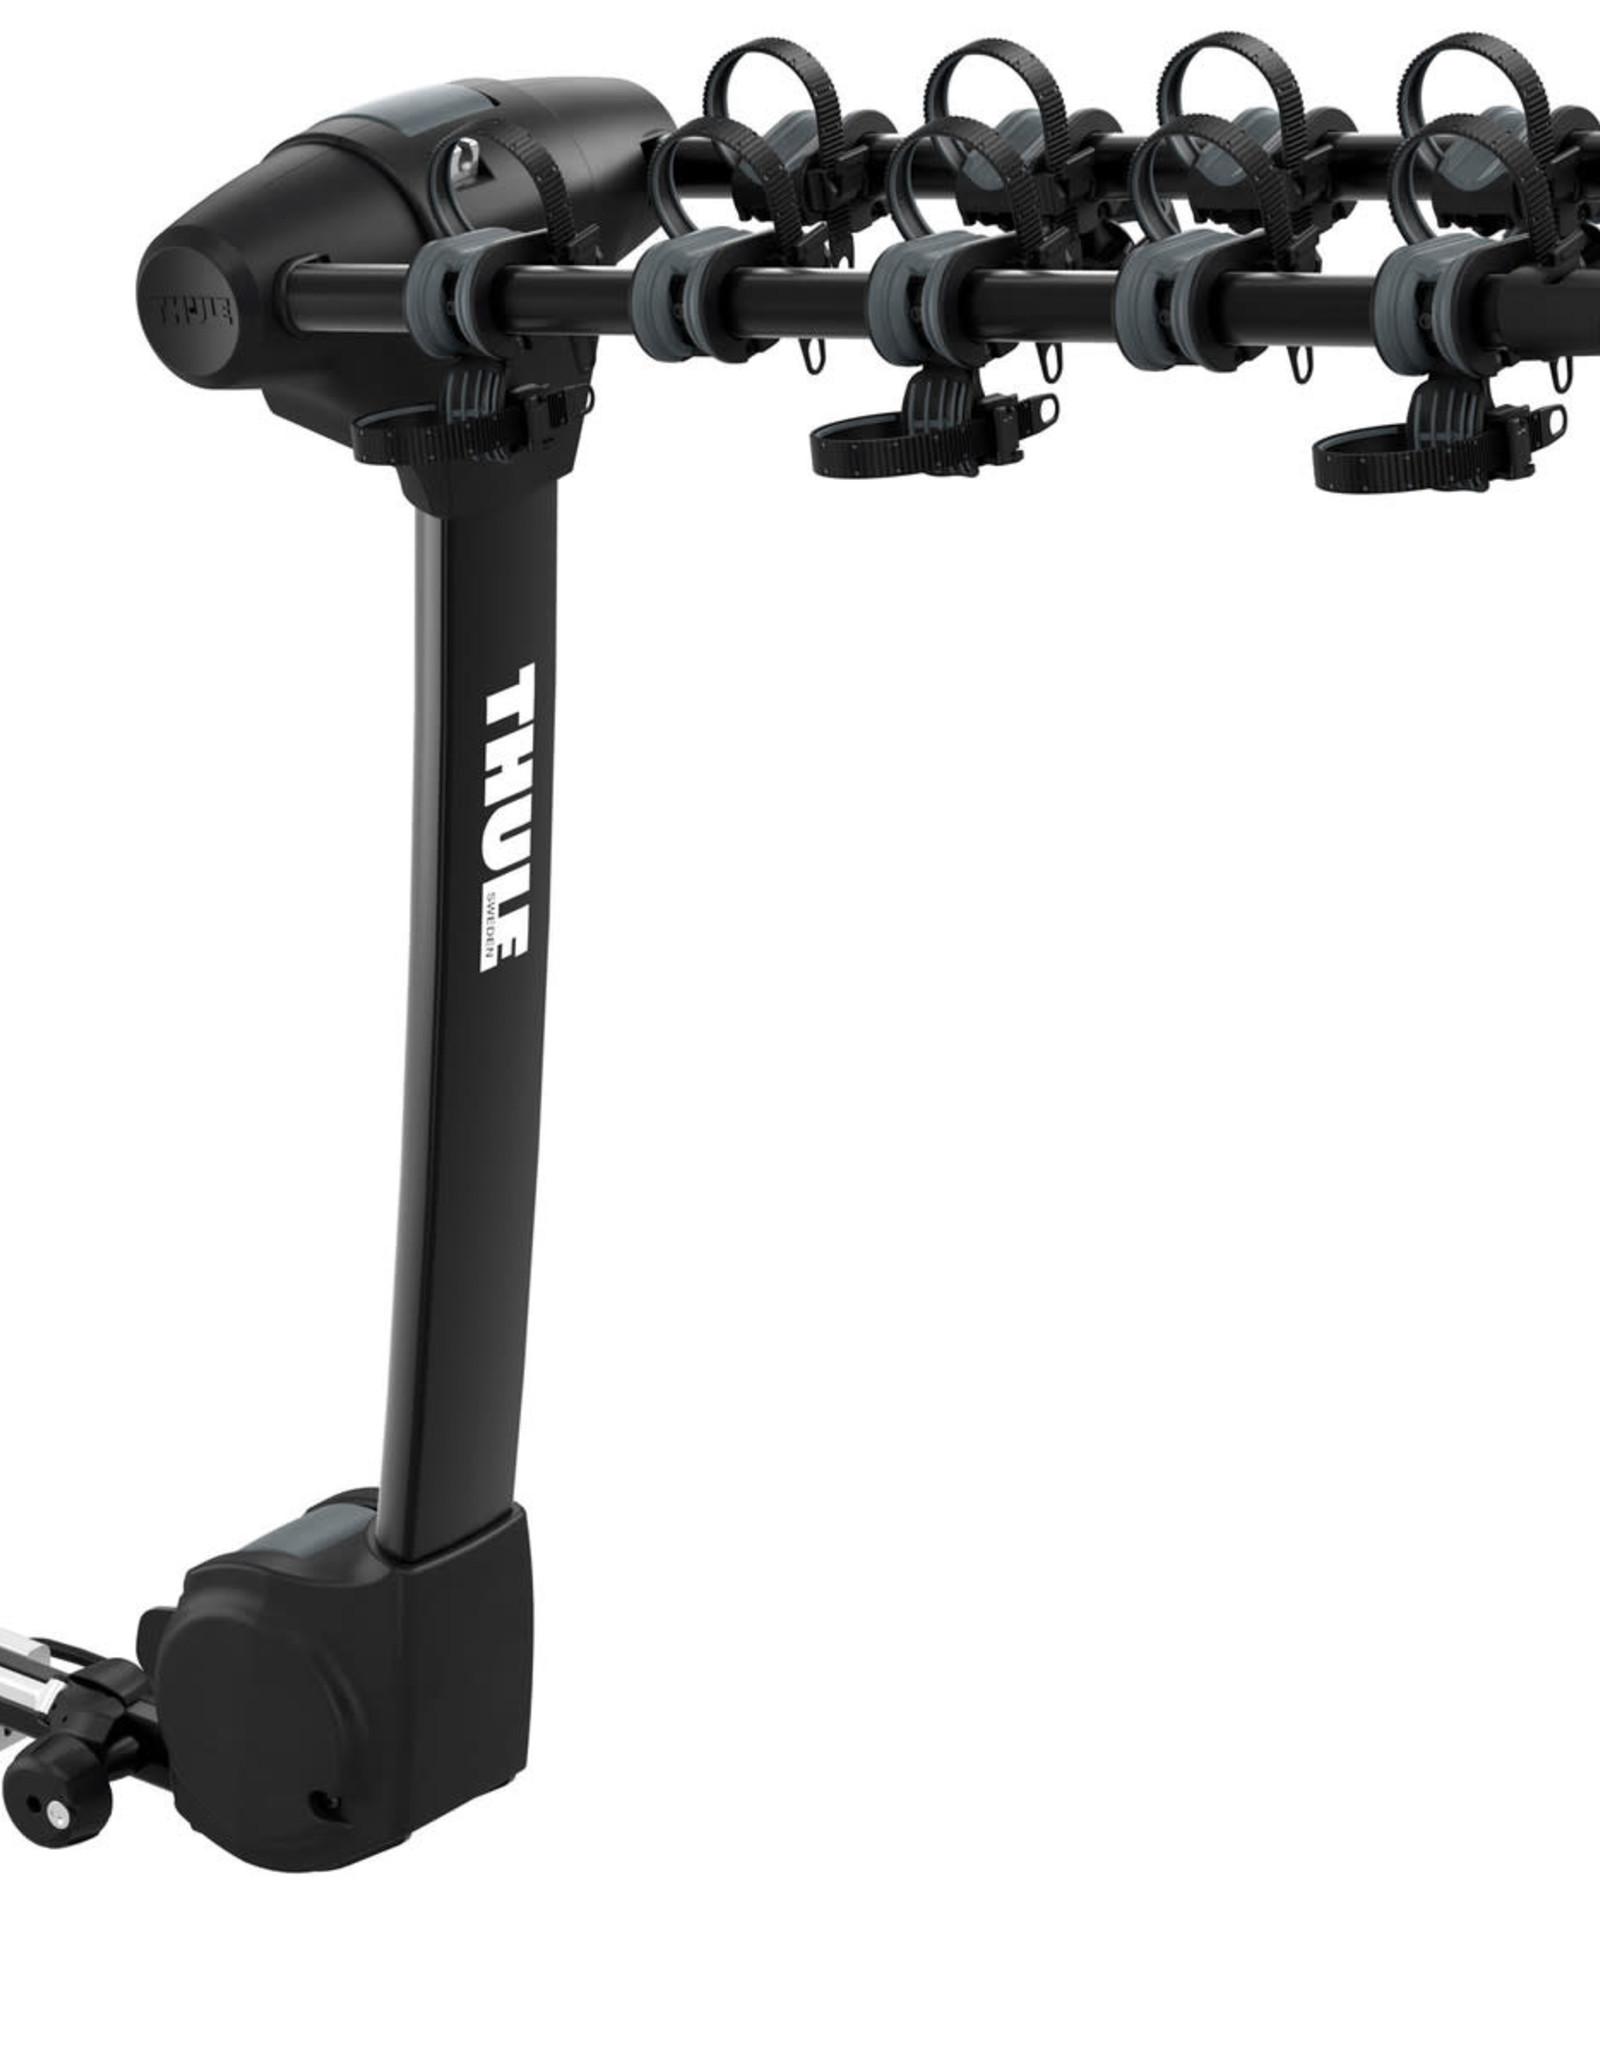 Thule Thule Apex XT 5 Hitch Bike Rack 5 Bike Universal